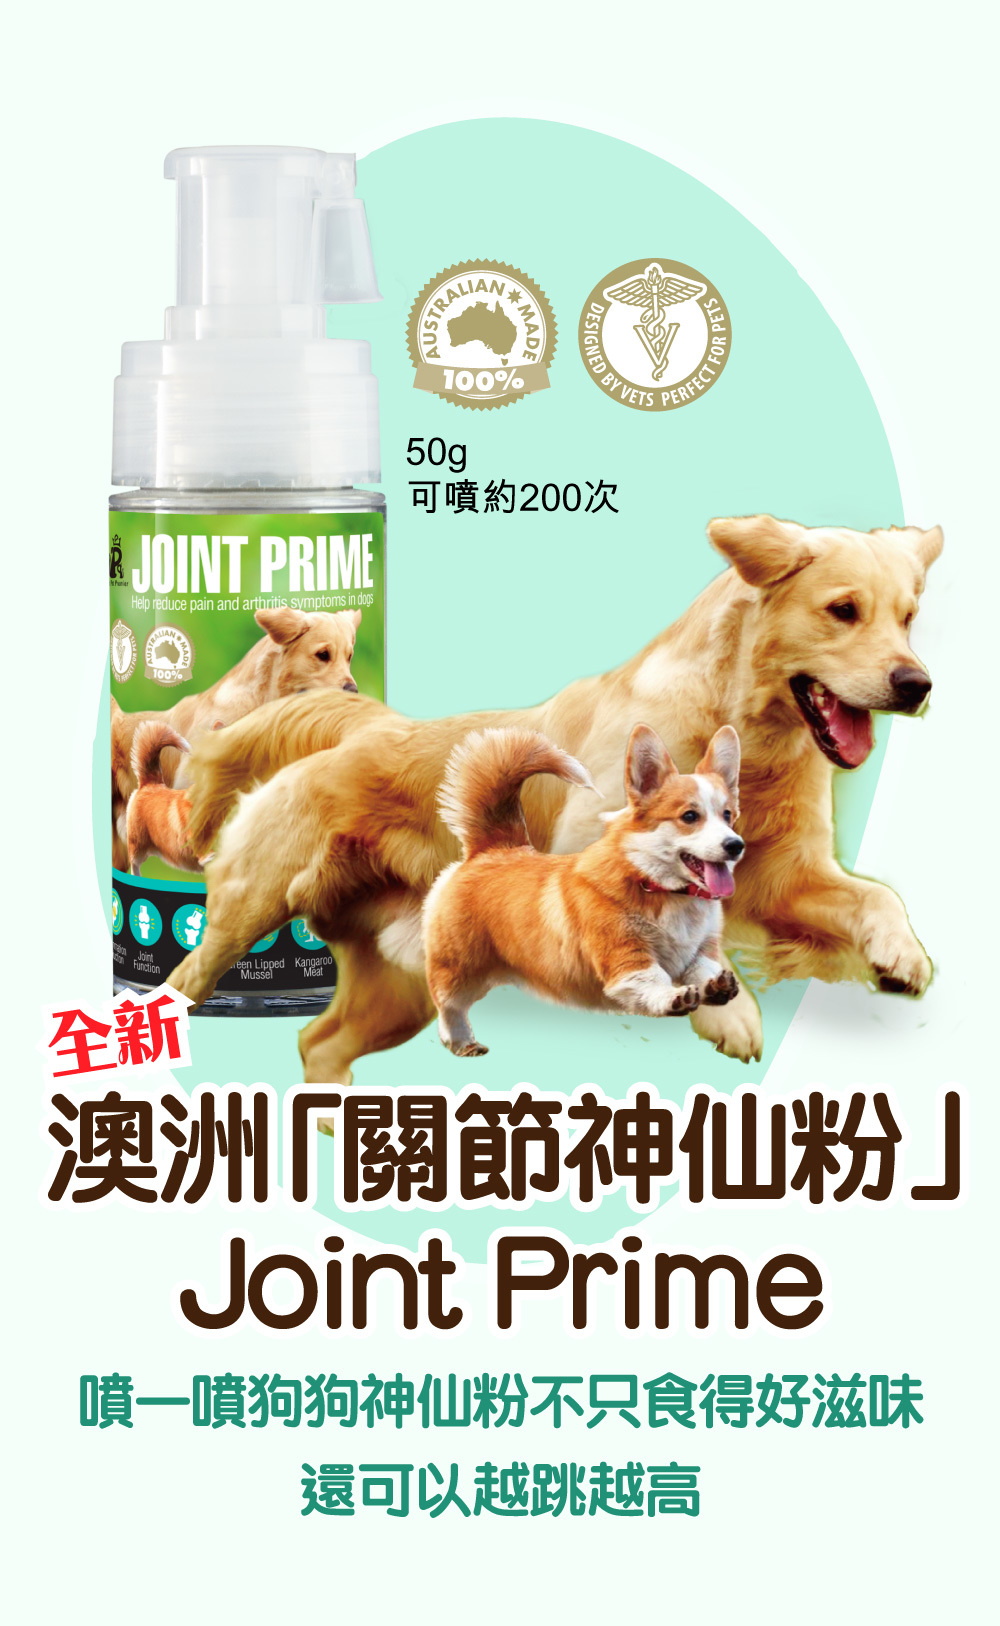 Pet Pet Premier, Joint Prime, Health Prime, 狗狗神仙粉, 關節神仙粉, 狗保健品,澳洲健骨抗關節炎噴劑